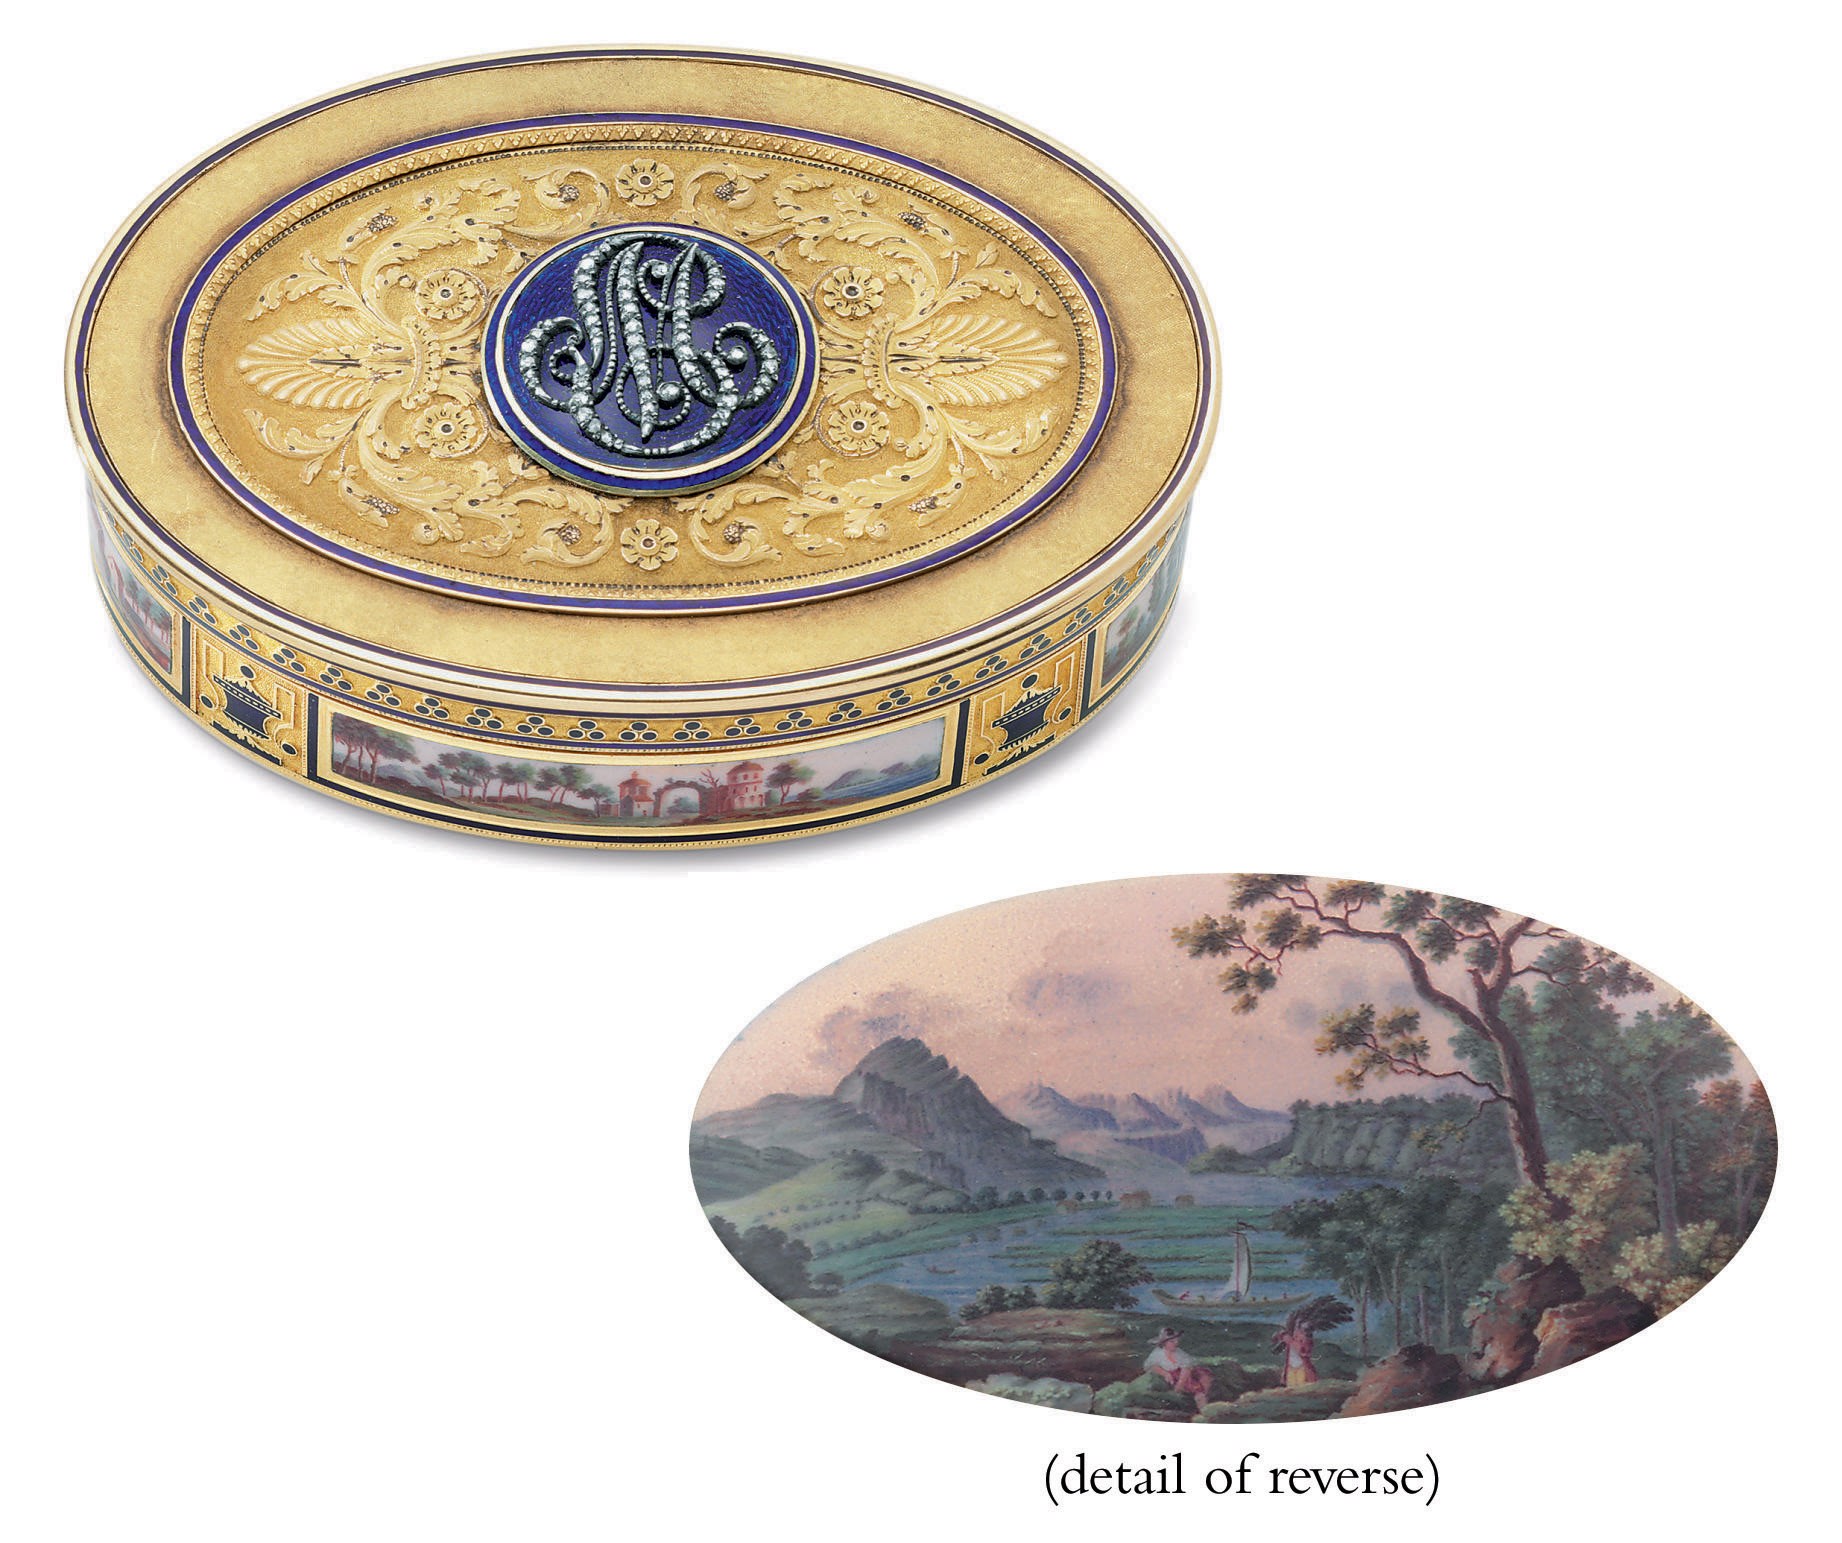 A FRENCH EMPIRE GOLD, ENAMEL AND GEM-SET PRESENTATION SNUFF BOX